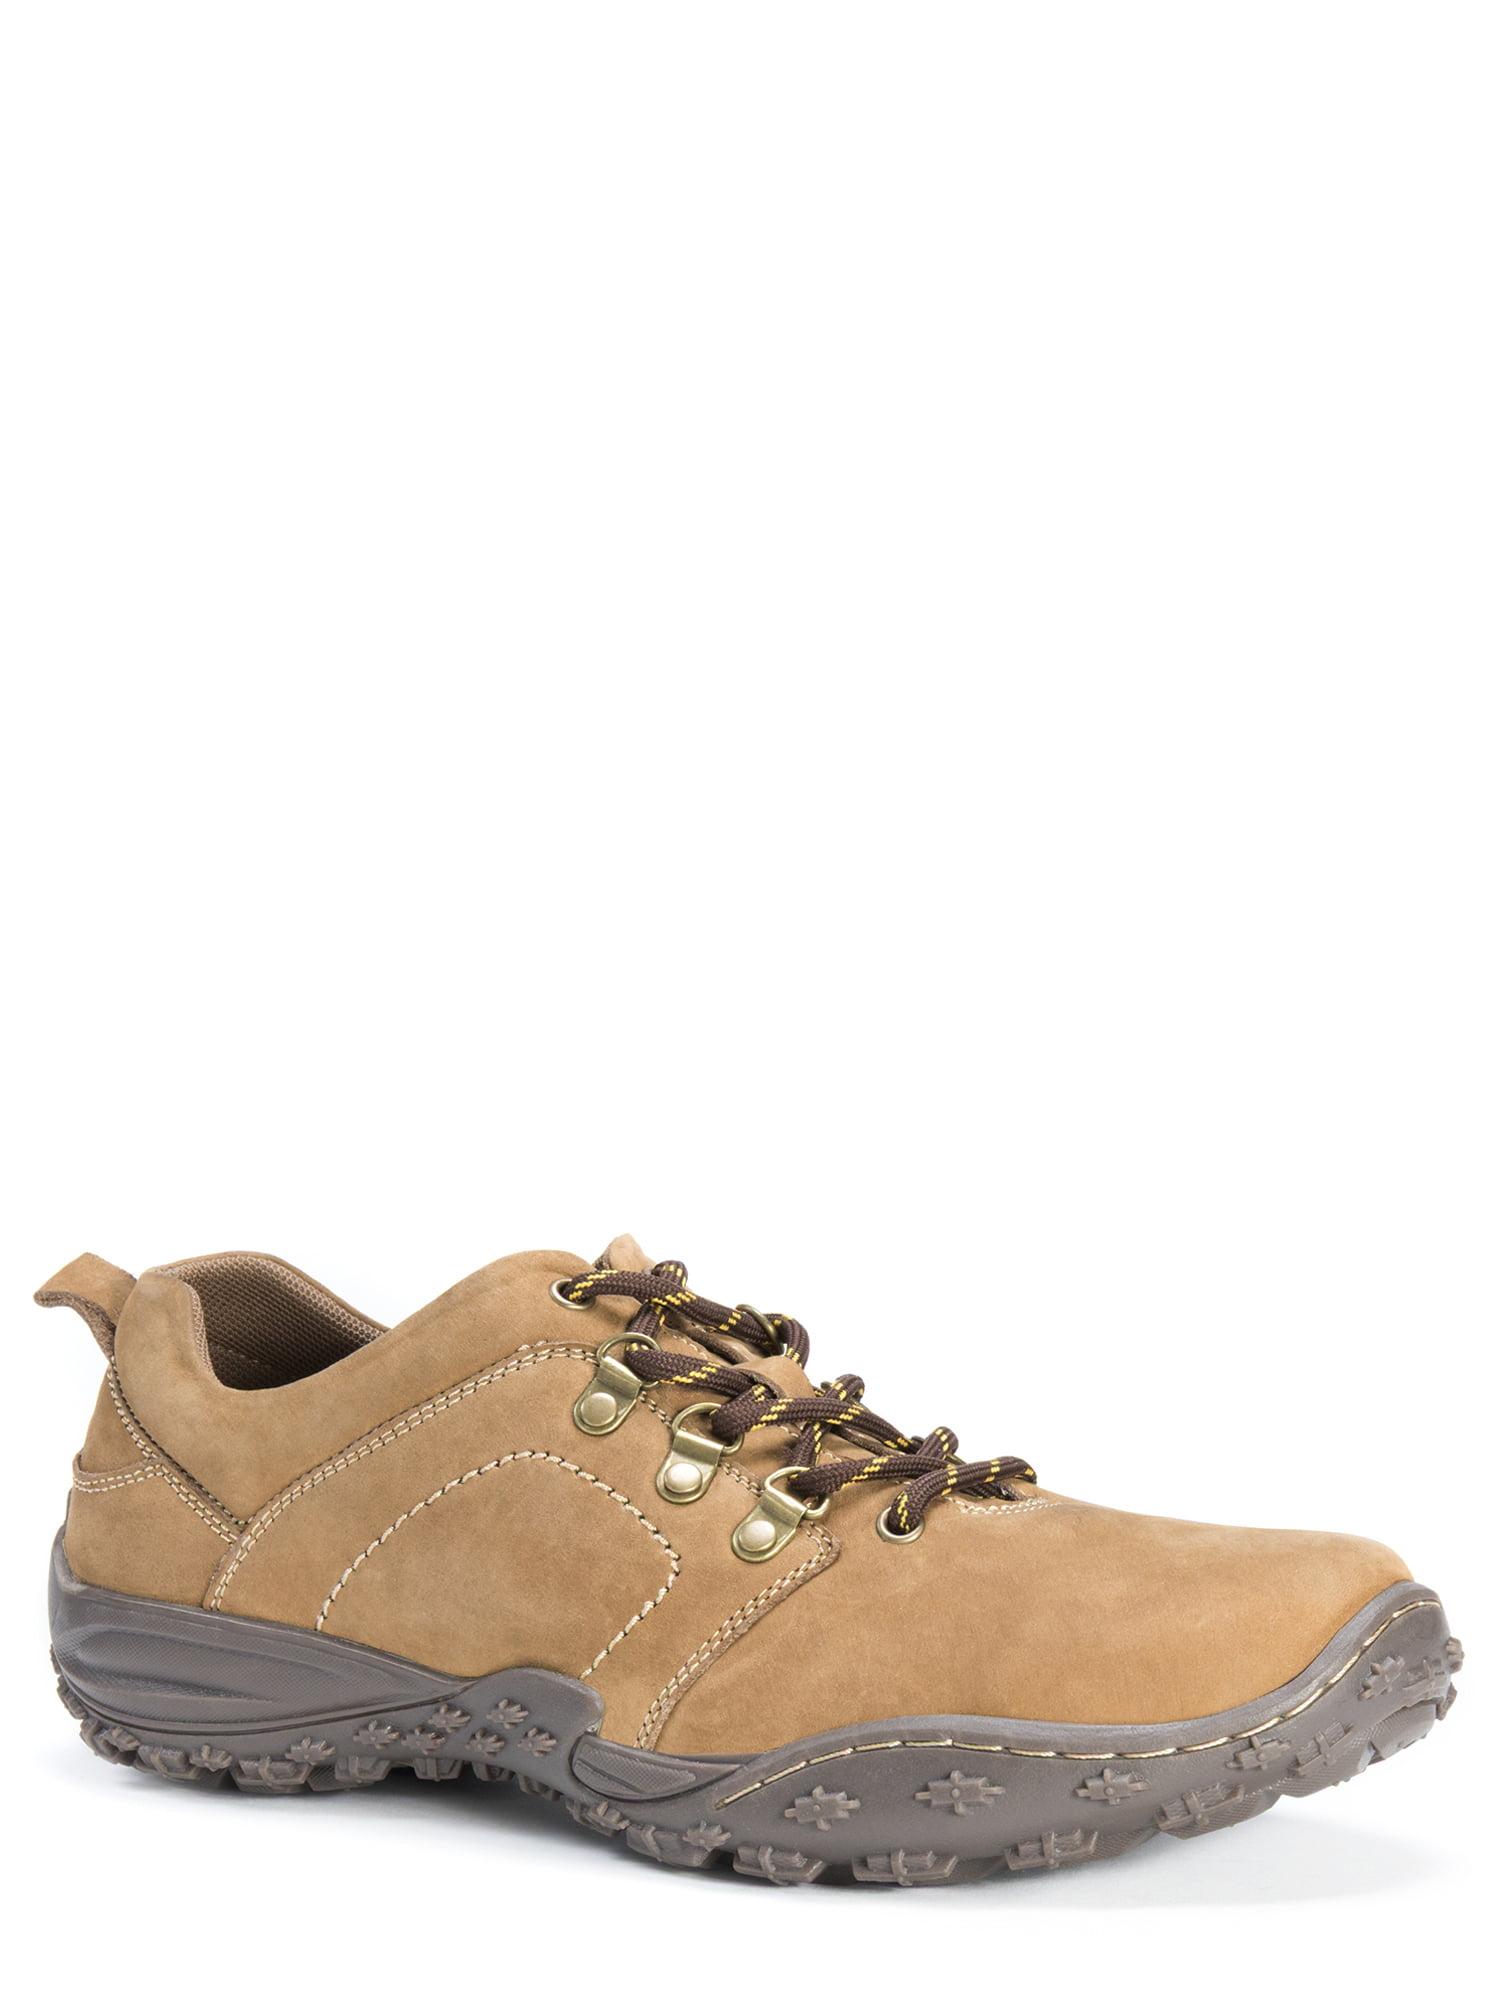 MUK LUKS Men's Kadin Shoes Economical, stylish, and eye-catching shoes